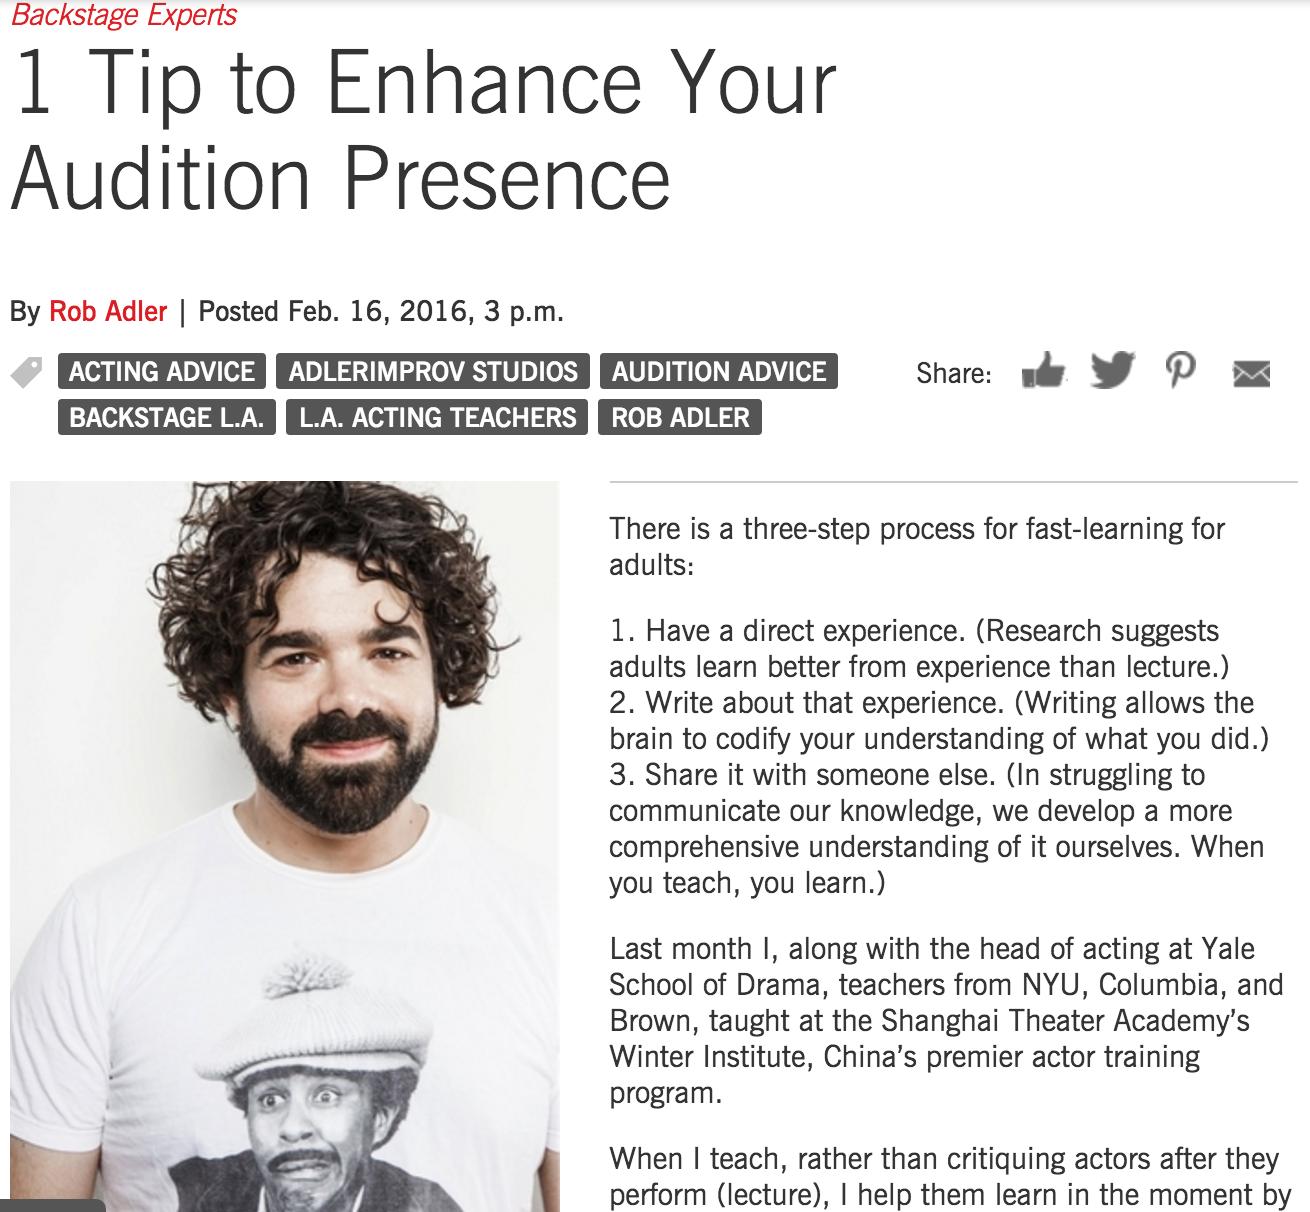 Rob Adler - Backstage - One Tip to Enhance Audition Presence